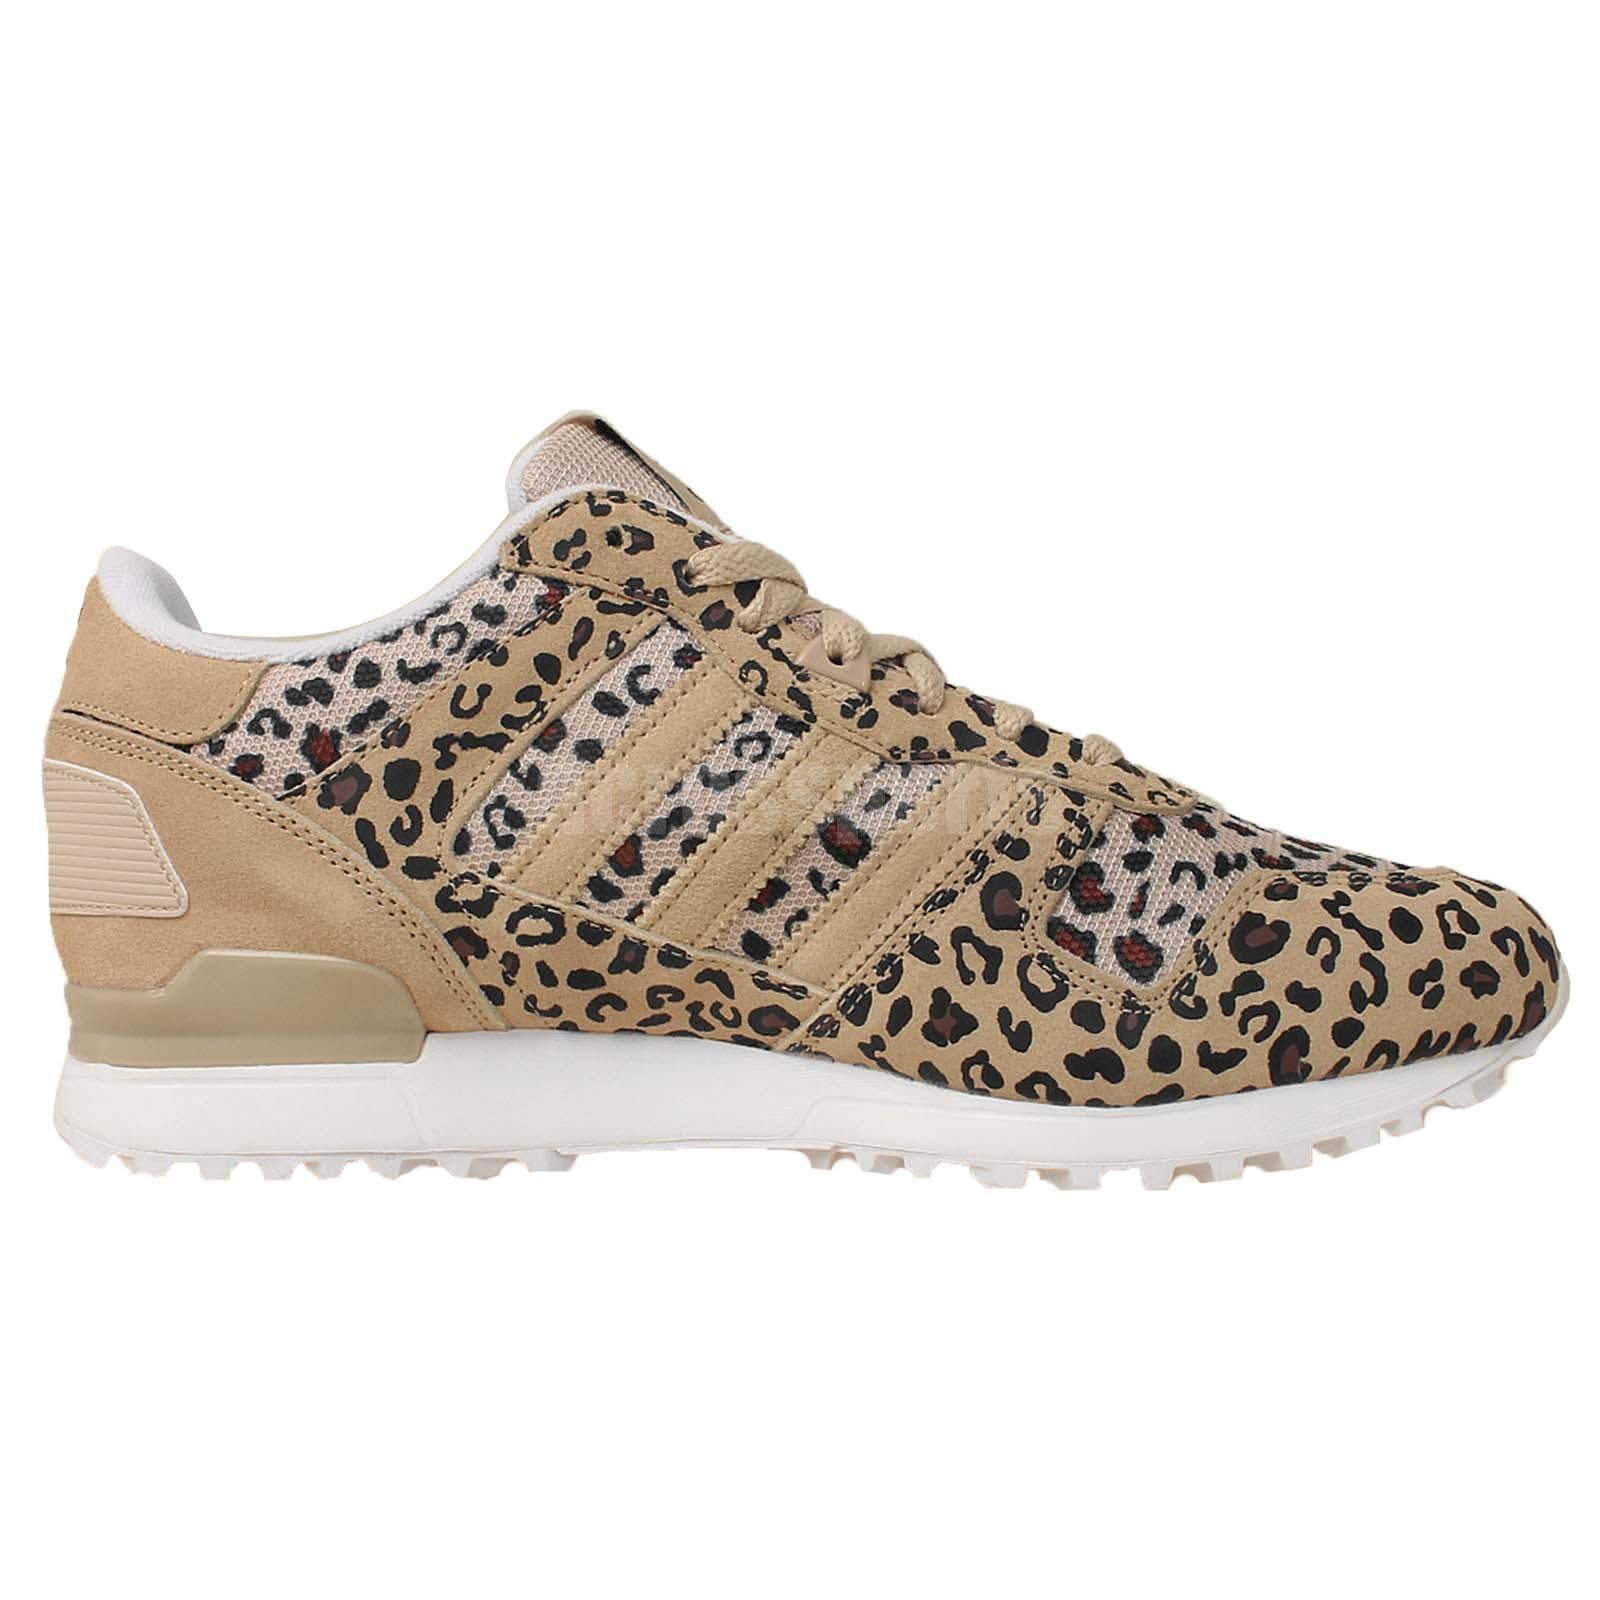 adidas originals zx 700 leopard